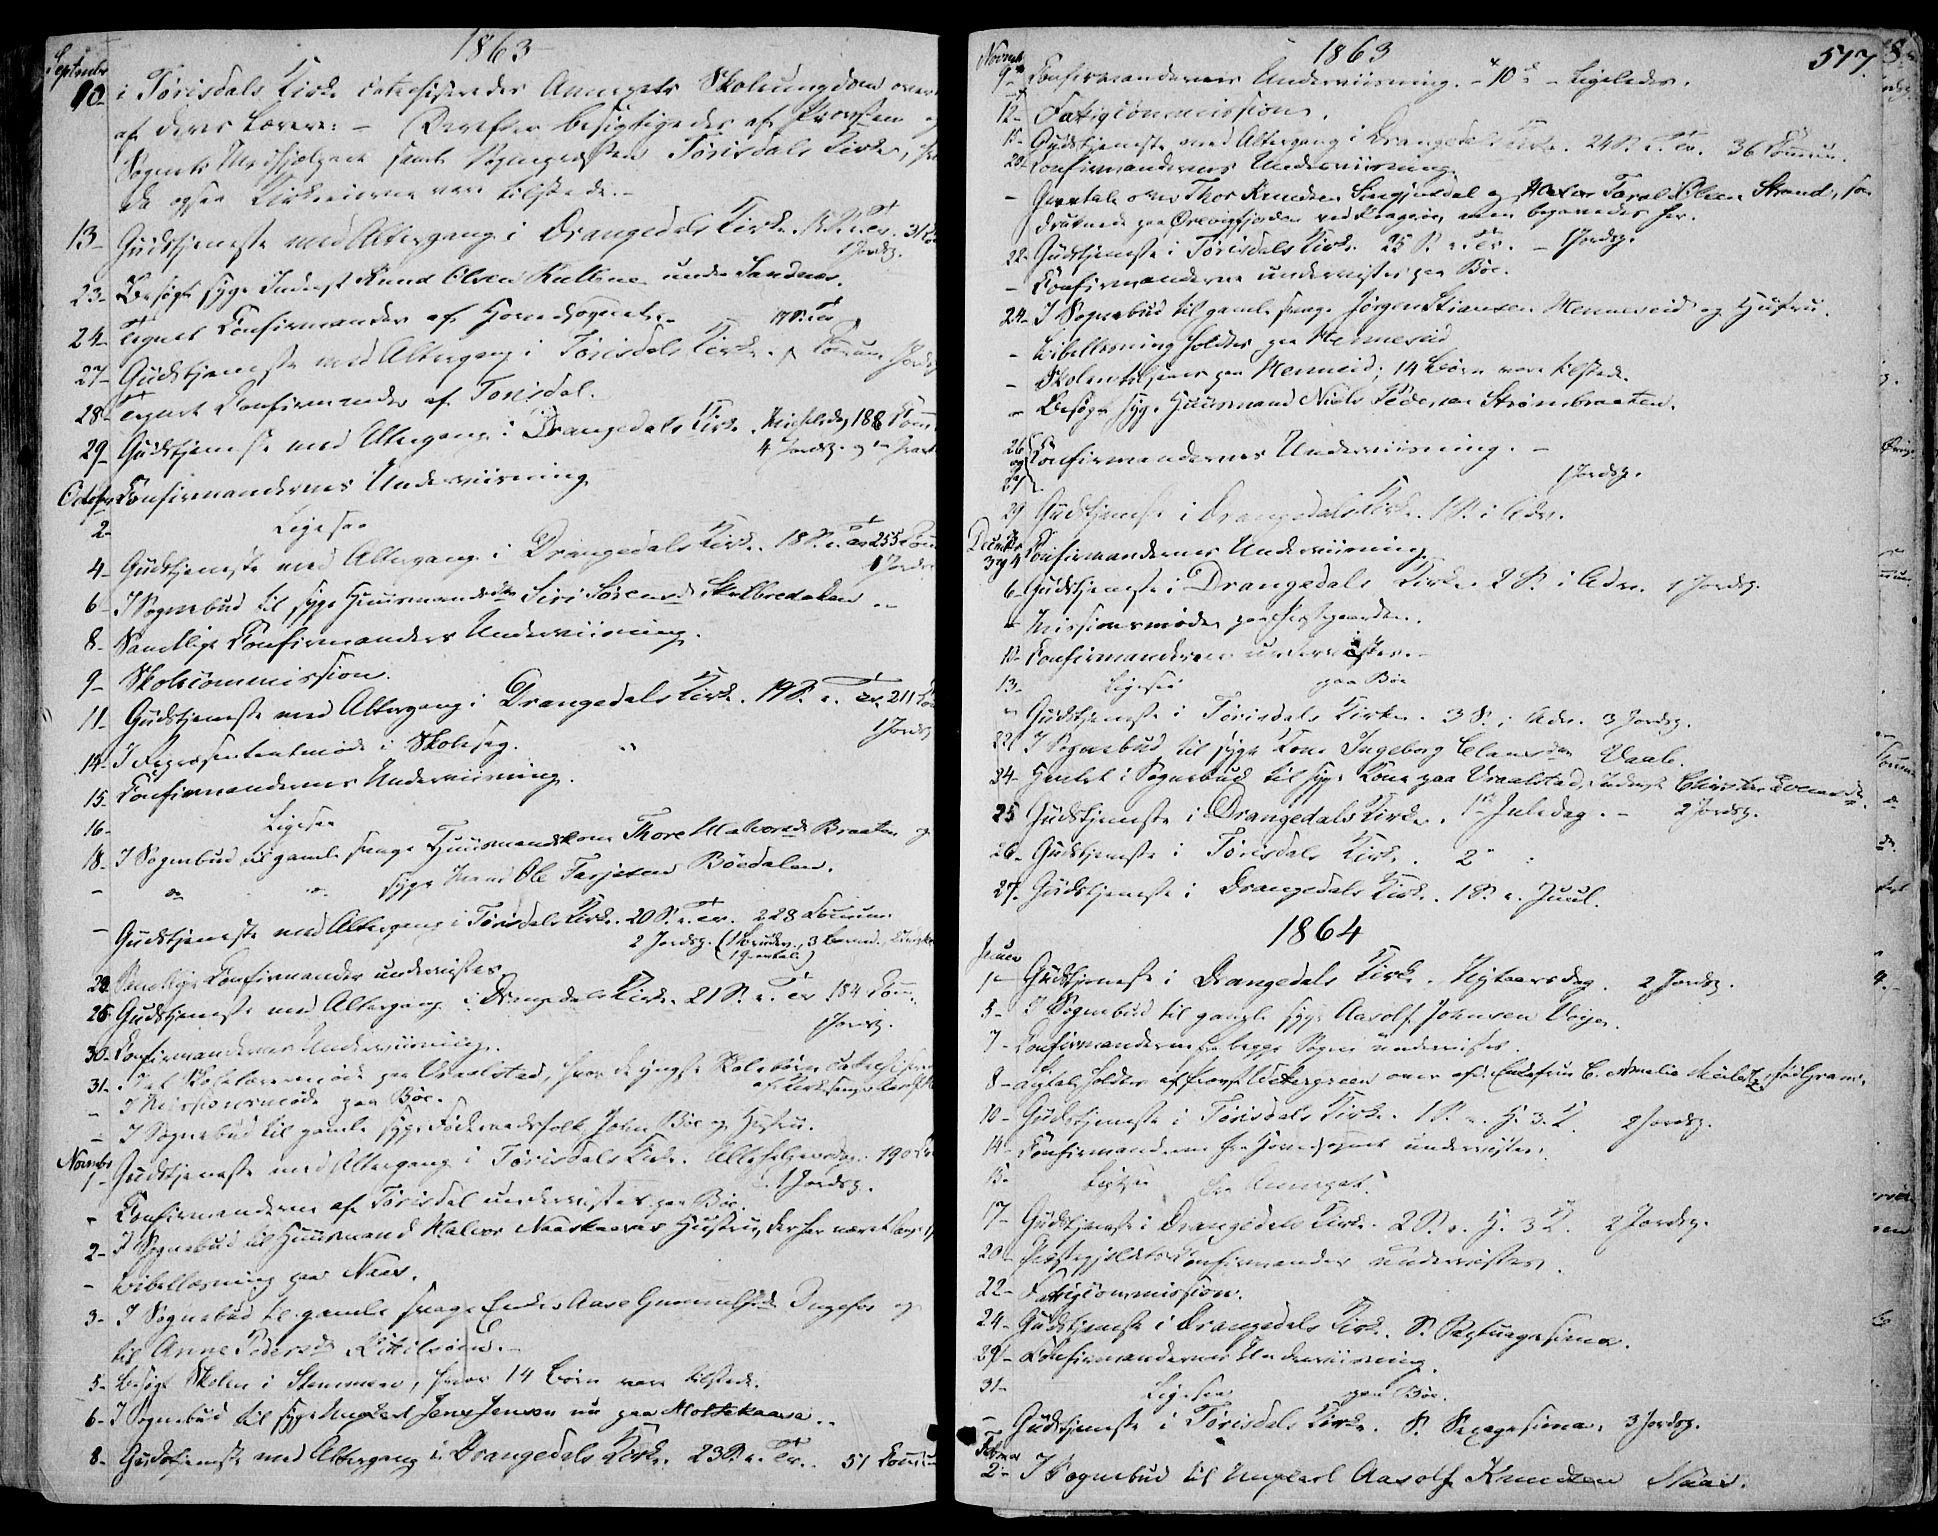 SAKO, Drangedal kirkebøker, F/Fa/L0008: Ministerialbok nr. 8, 1857-1871, s. 517